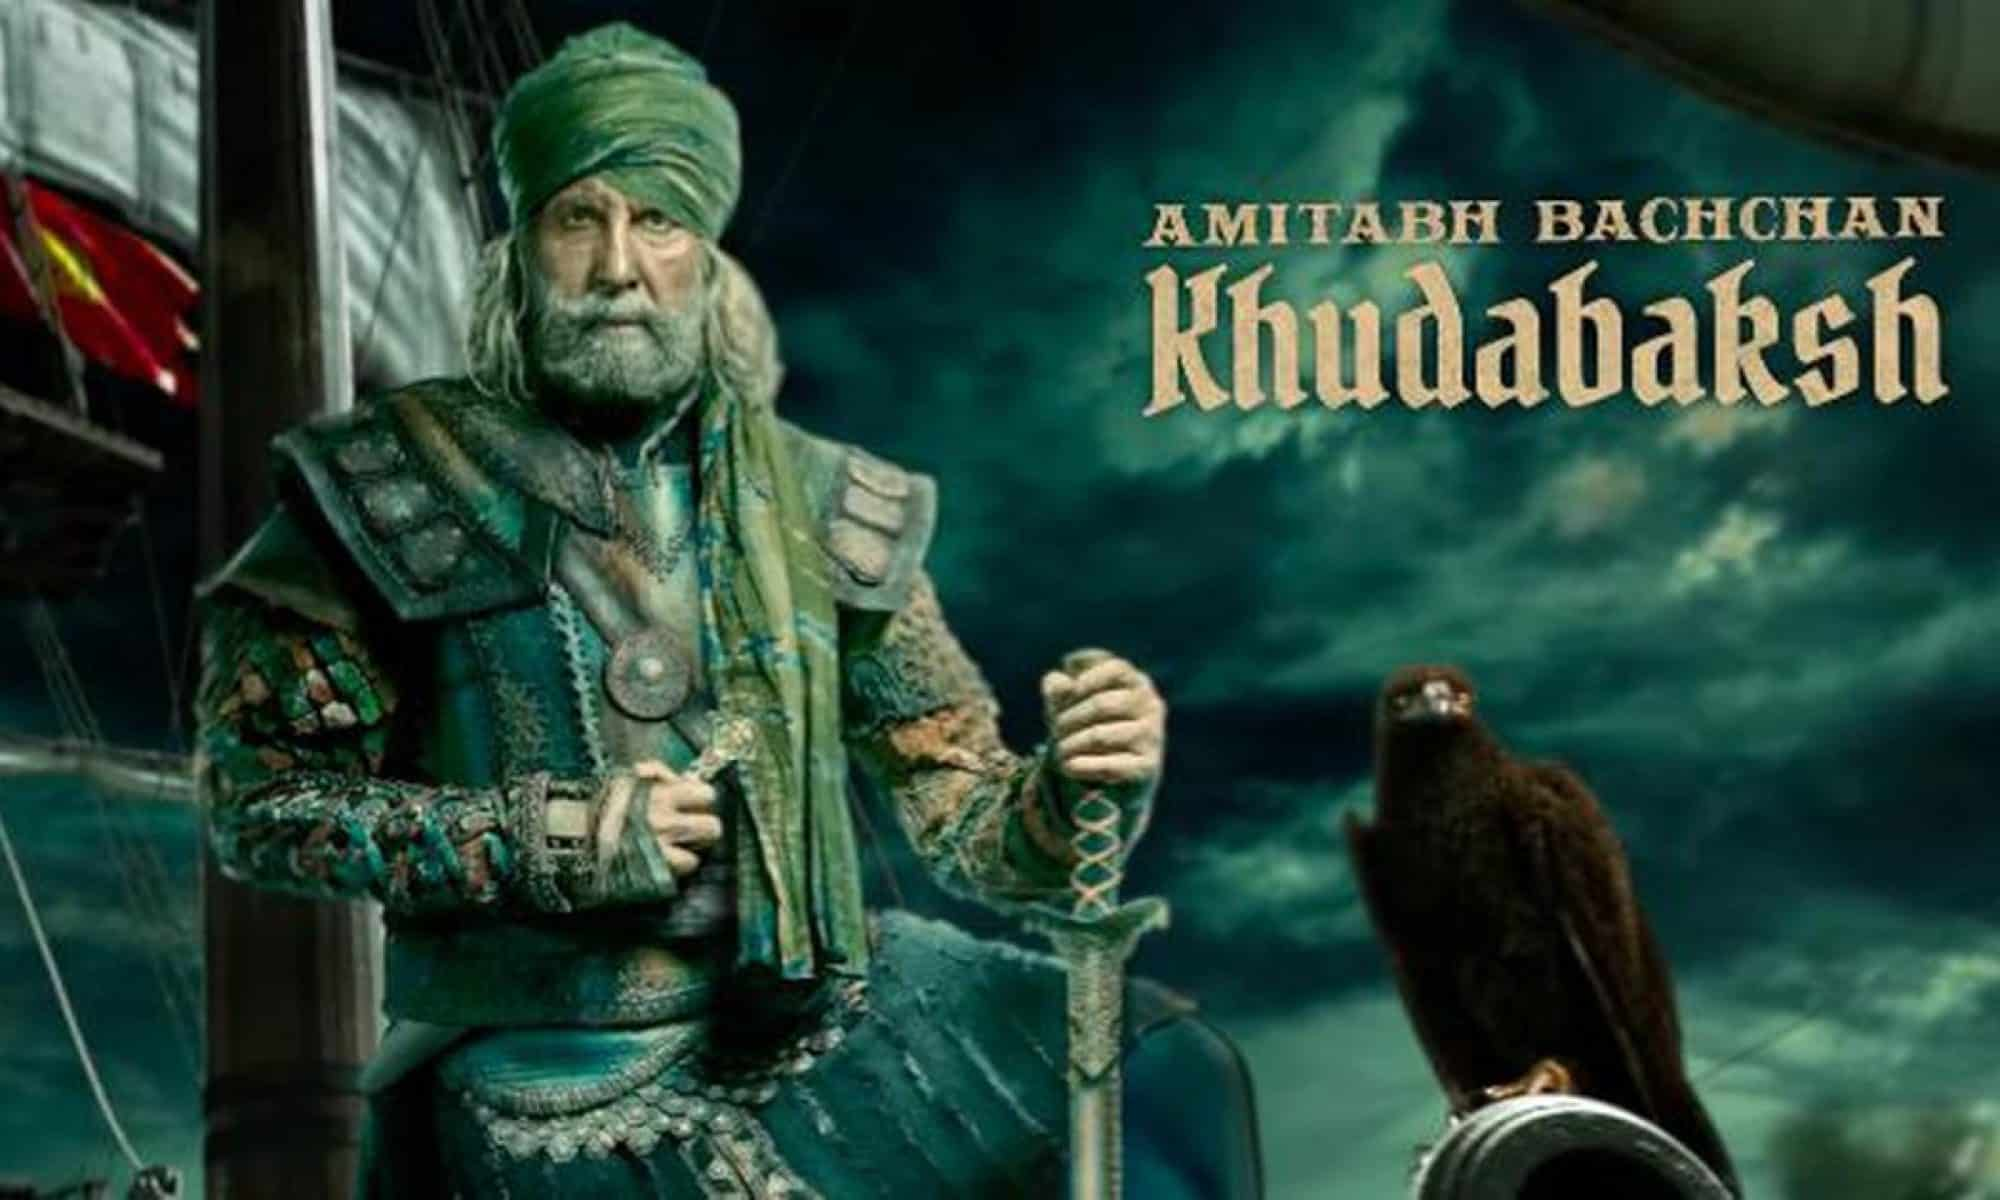 cropped-Amitabh4u-Amitabh-Bachchan-KhudaBaksh.jpeg